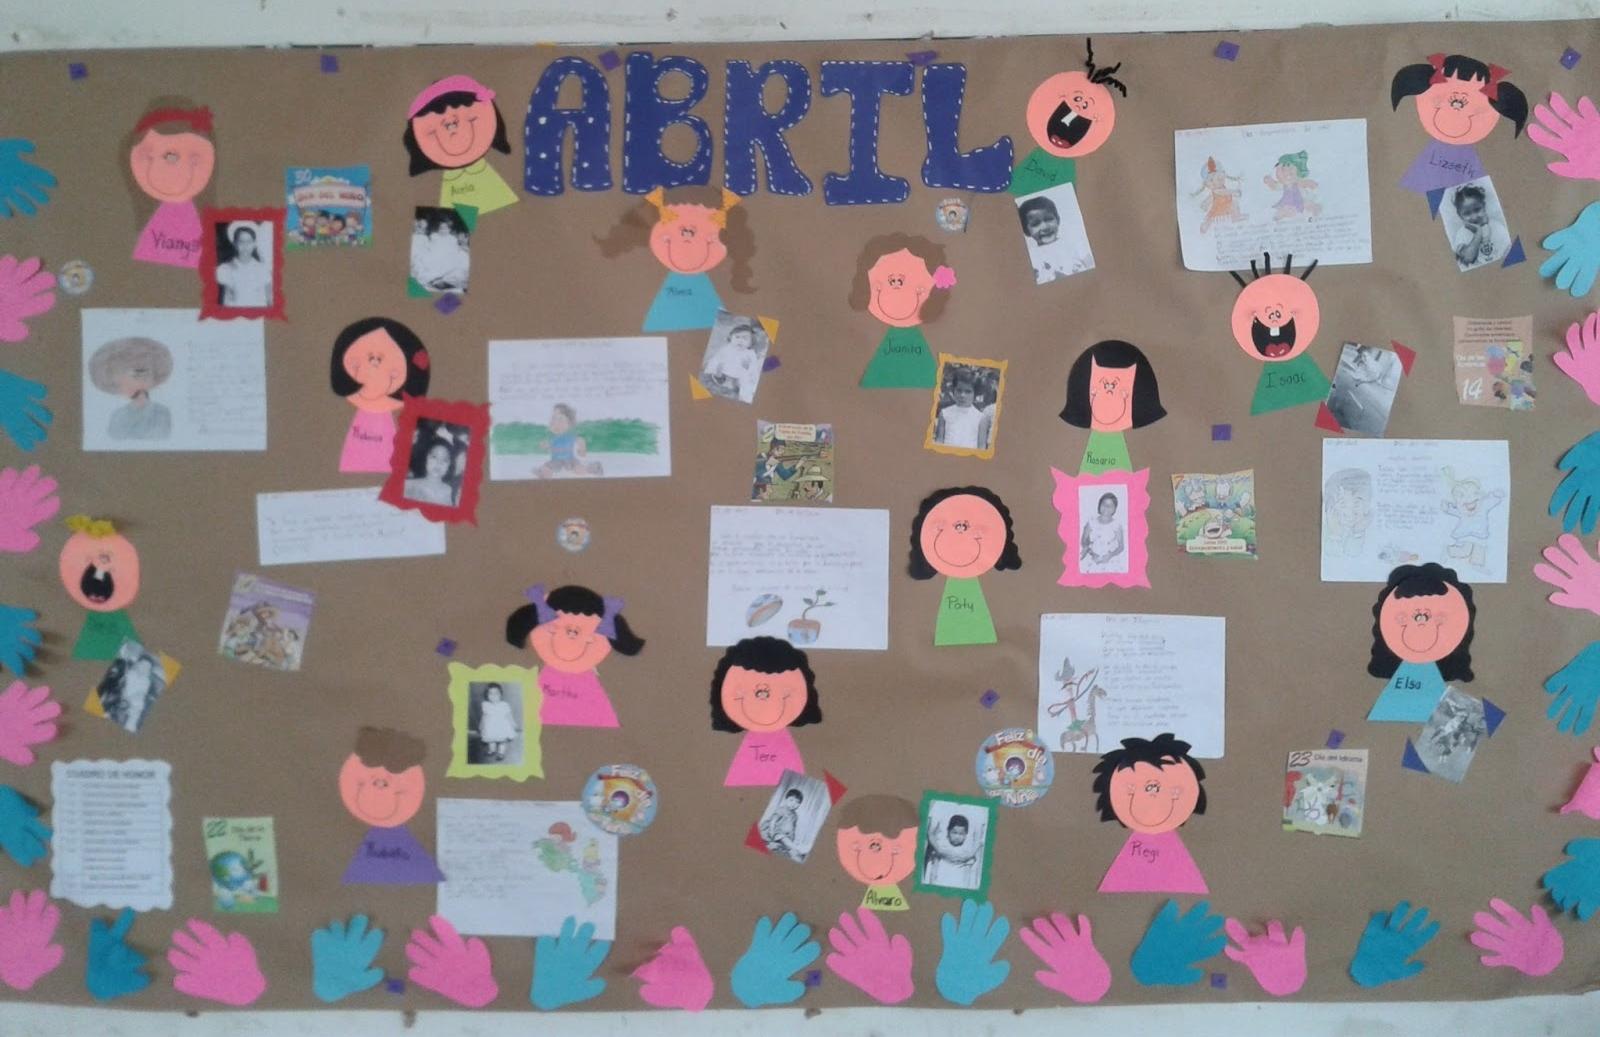 Periodico mural mes de abril 4 imagenes educativas for Amenidades para periodico mural